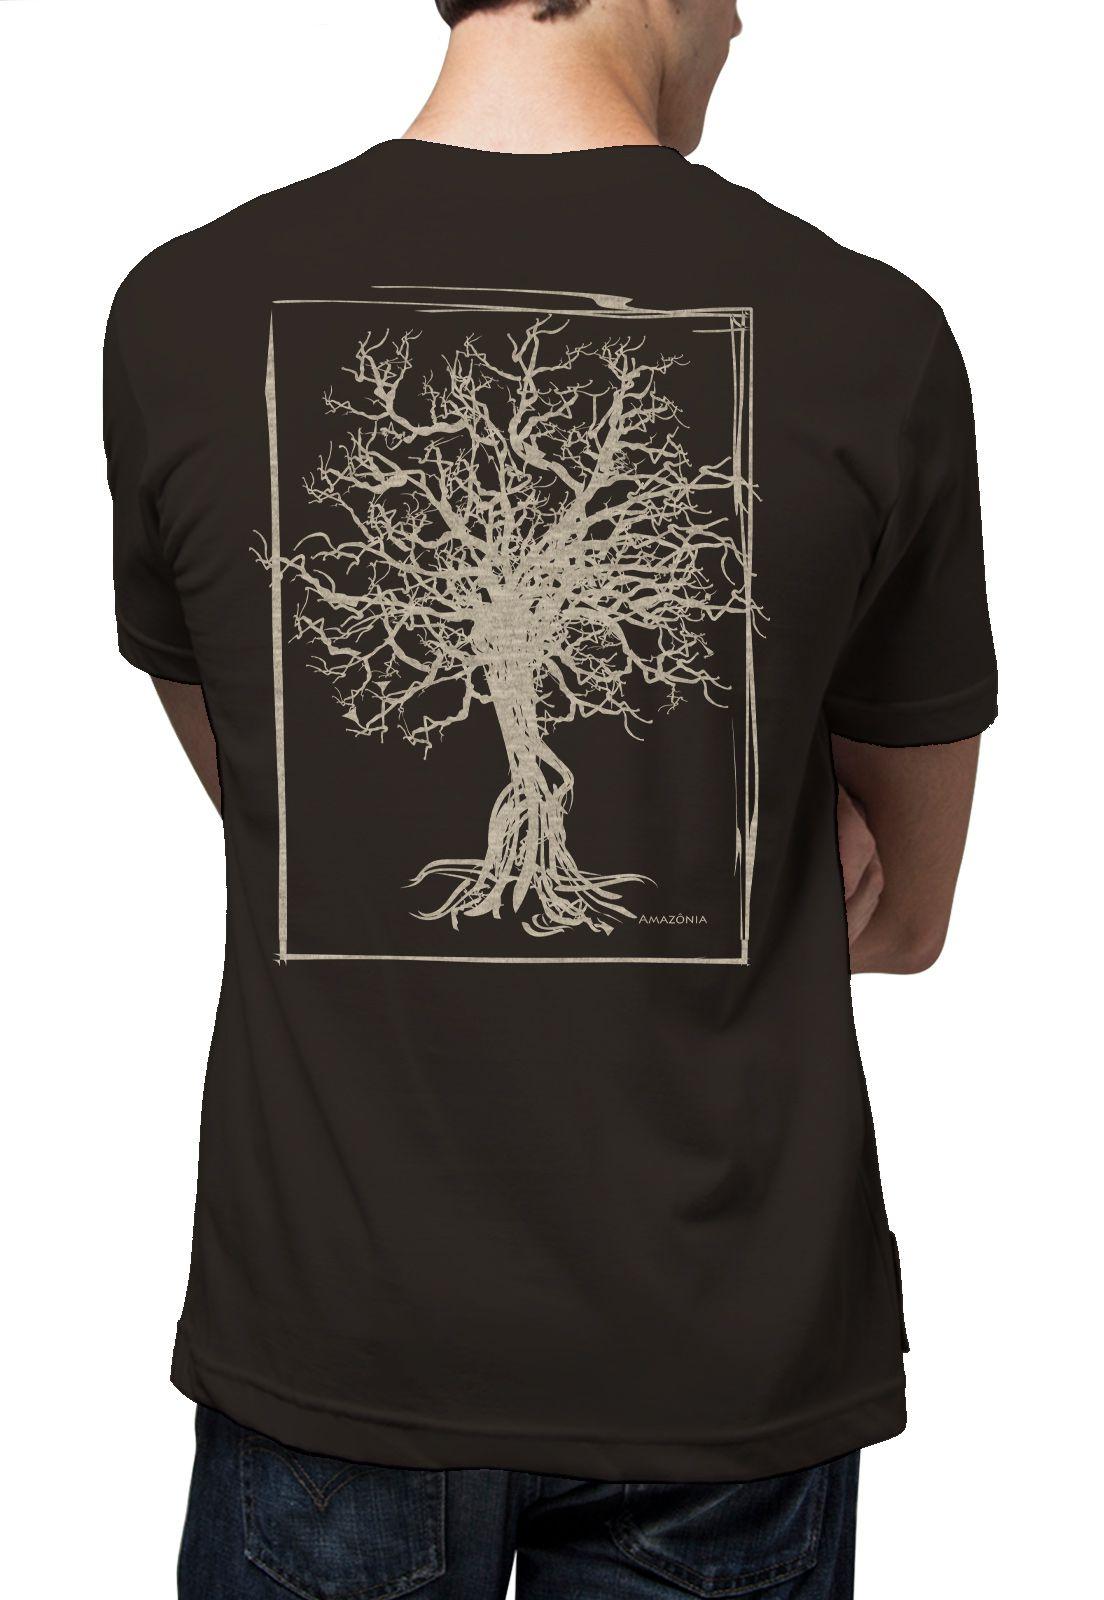 Camiseta Amazônia Quadro Desmatamento - Cinza Escuro